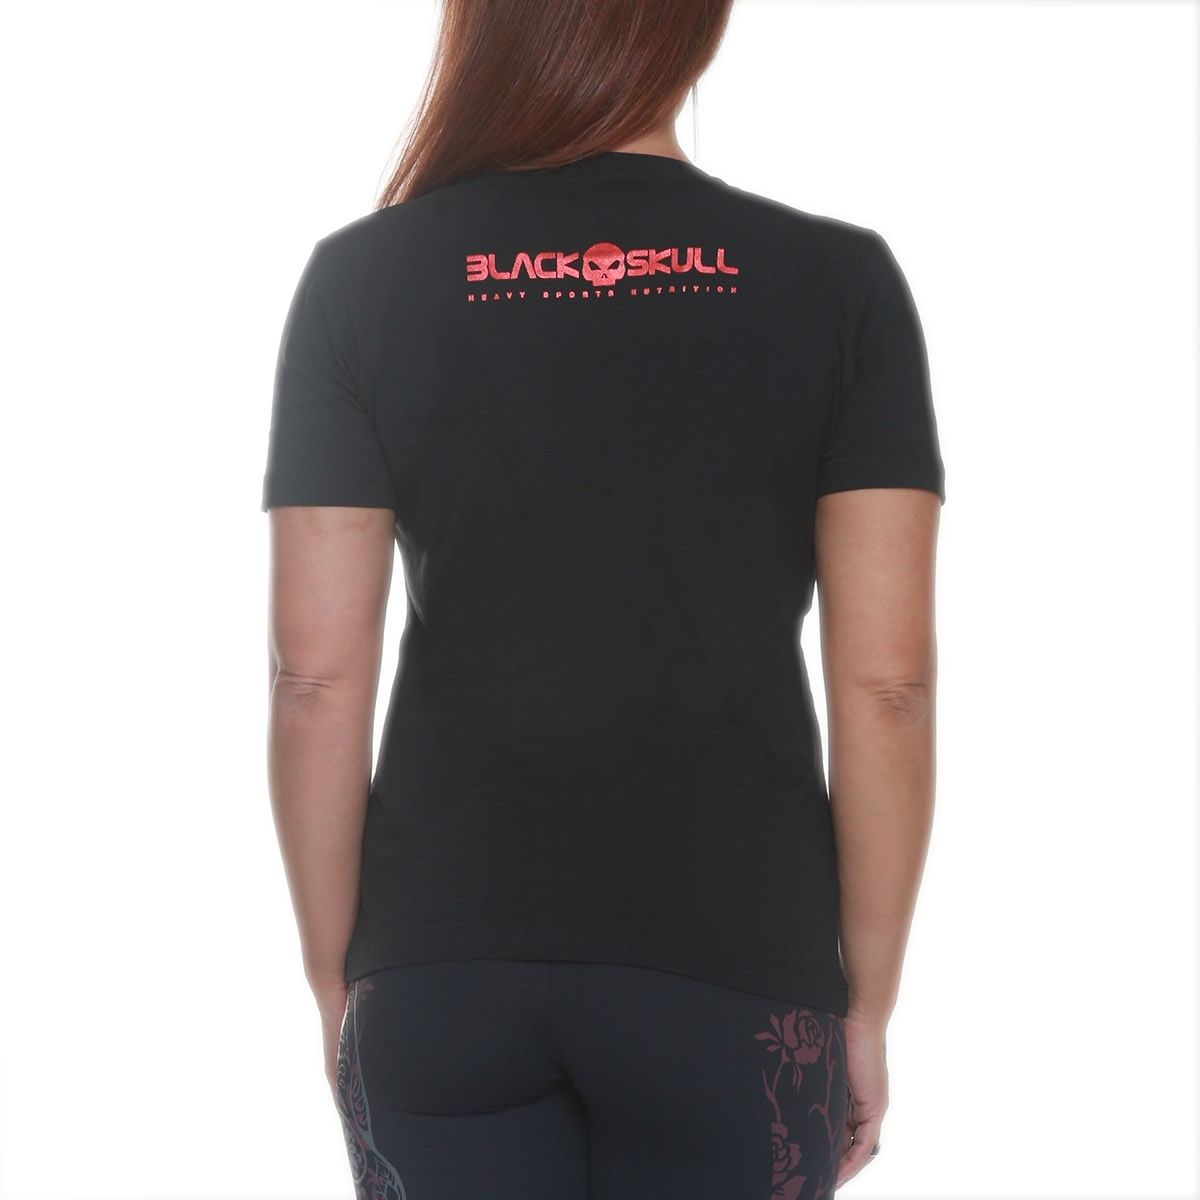 Camiseta Carol Saraiva Preto - Black Skull